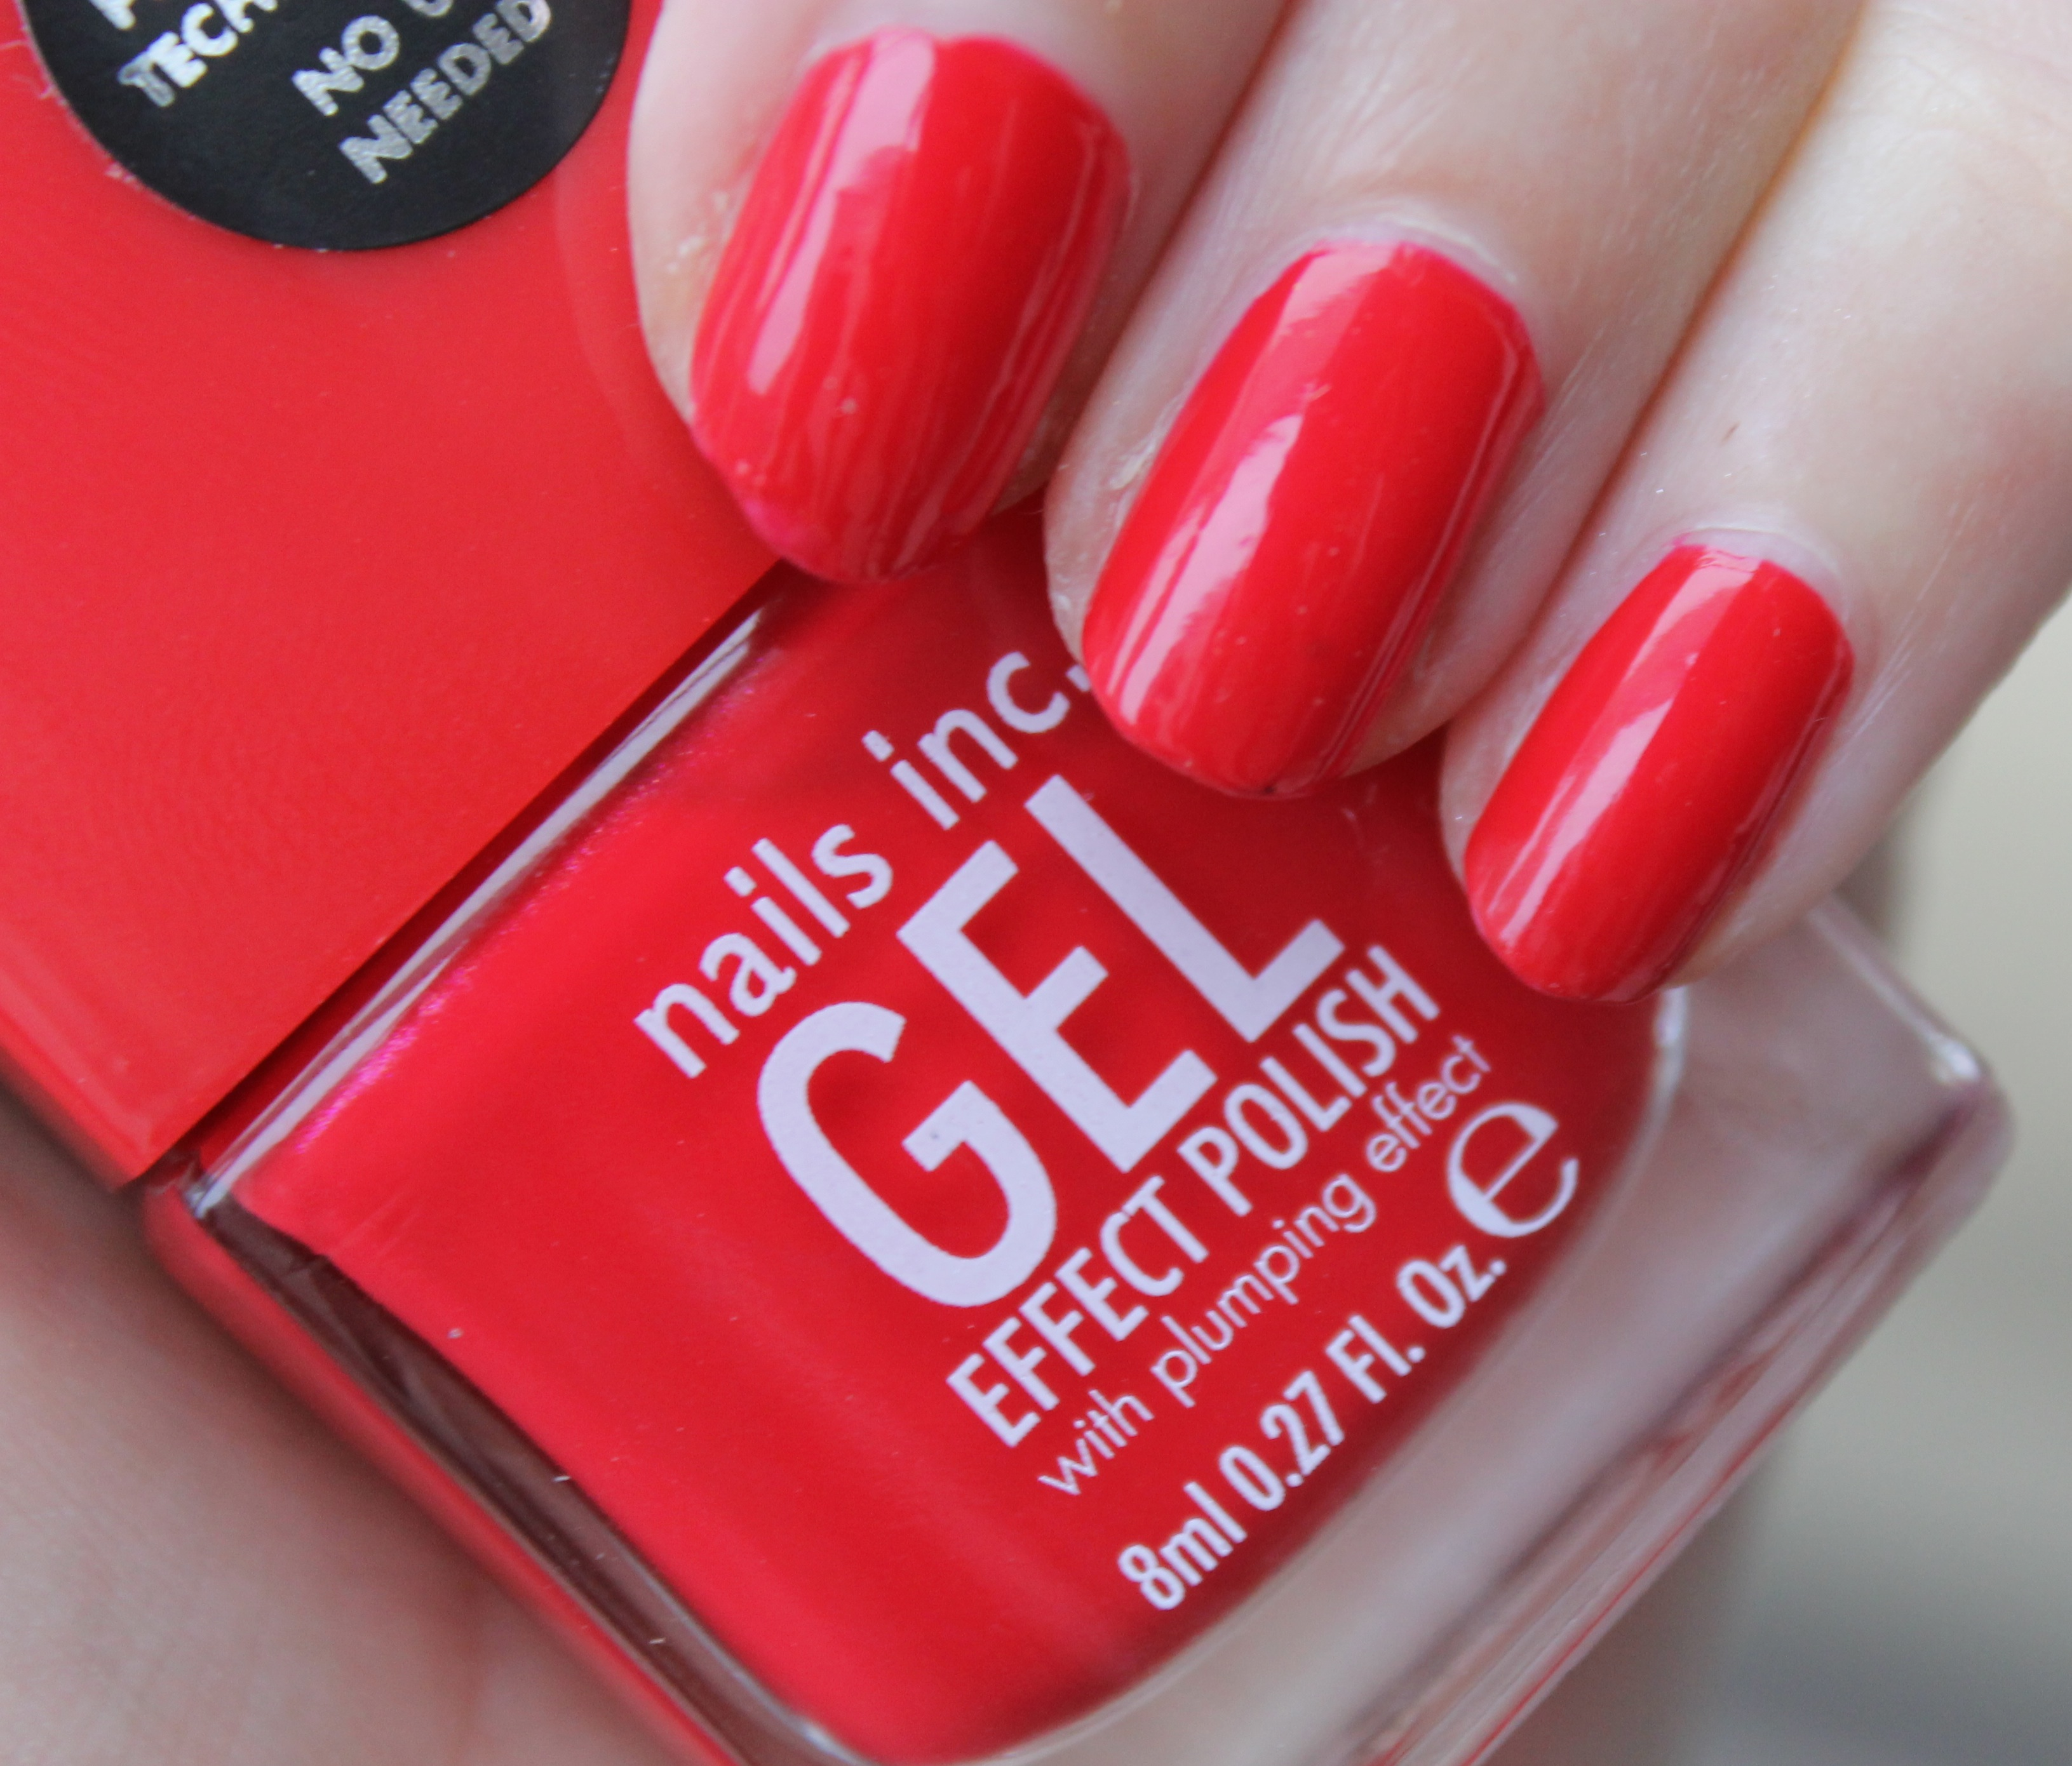 nails inc gel effect photo - 1